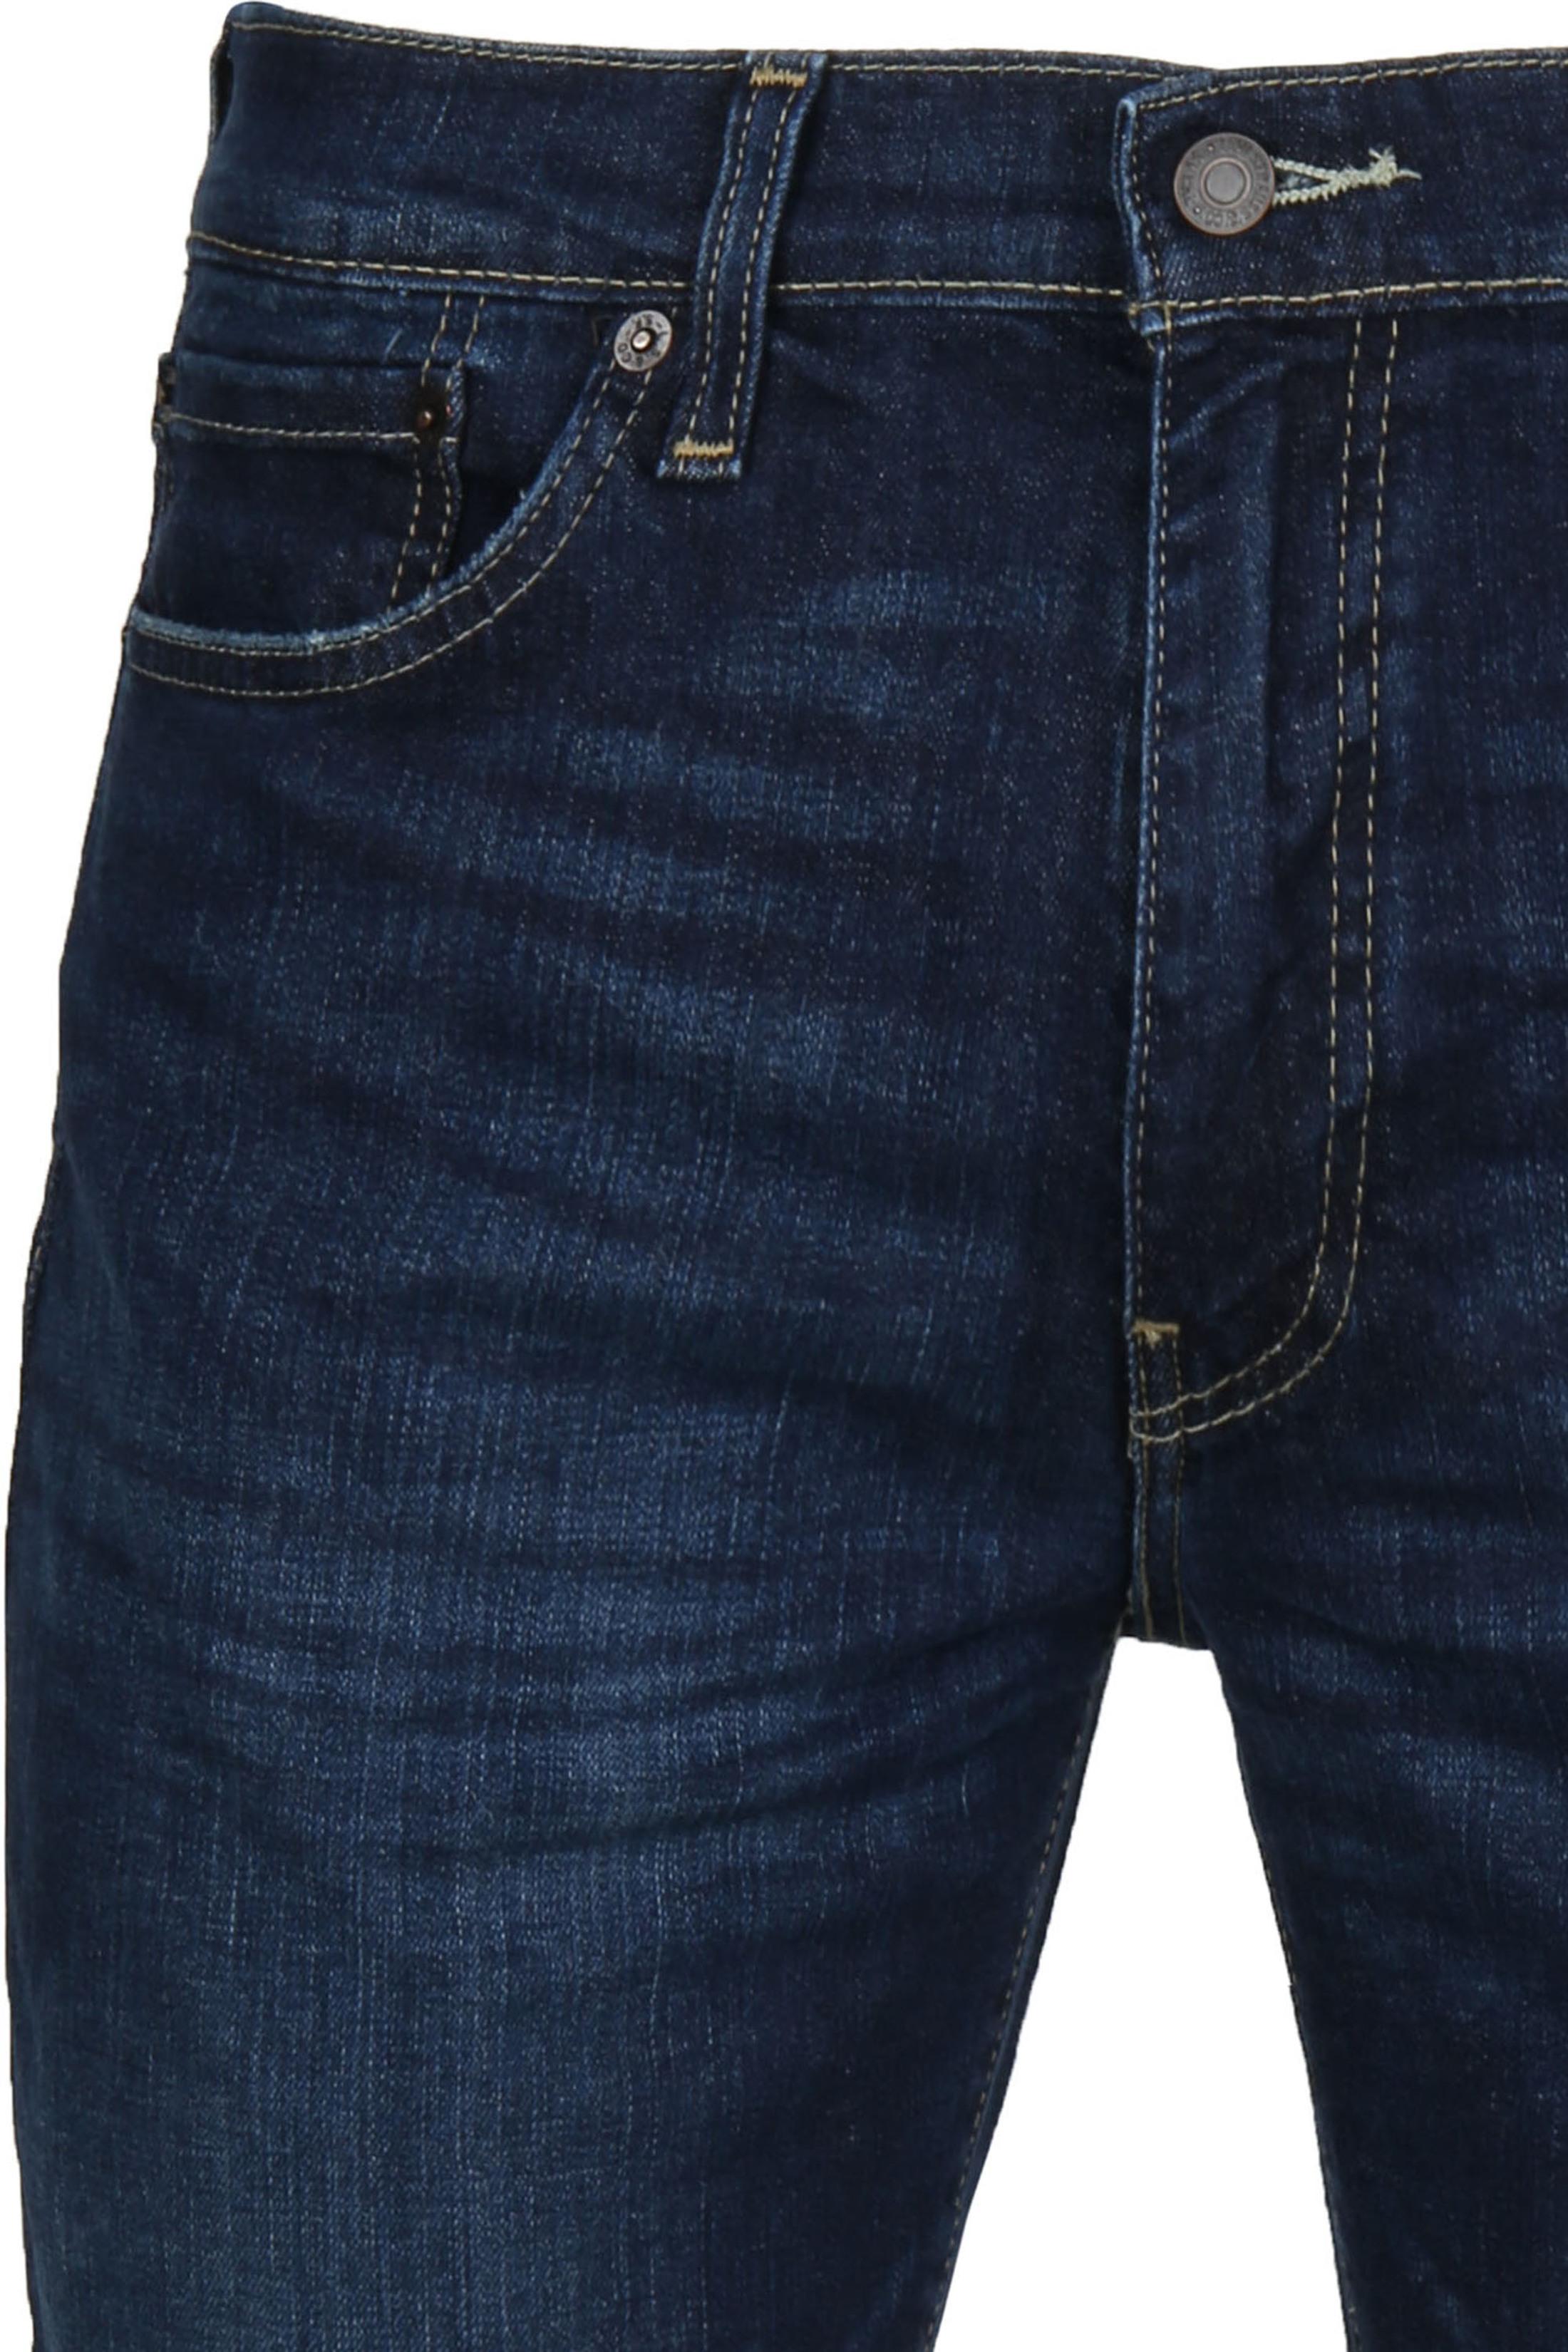 Levi's 511 Jeans Slim Fit 0709